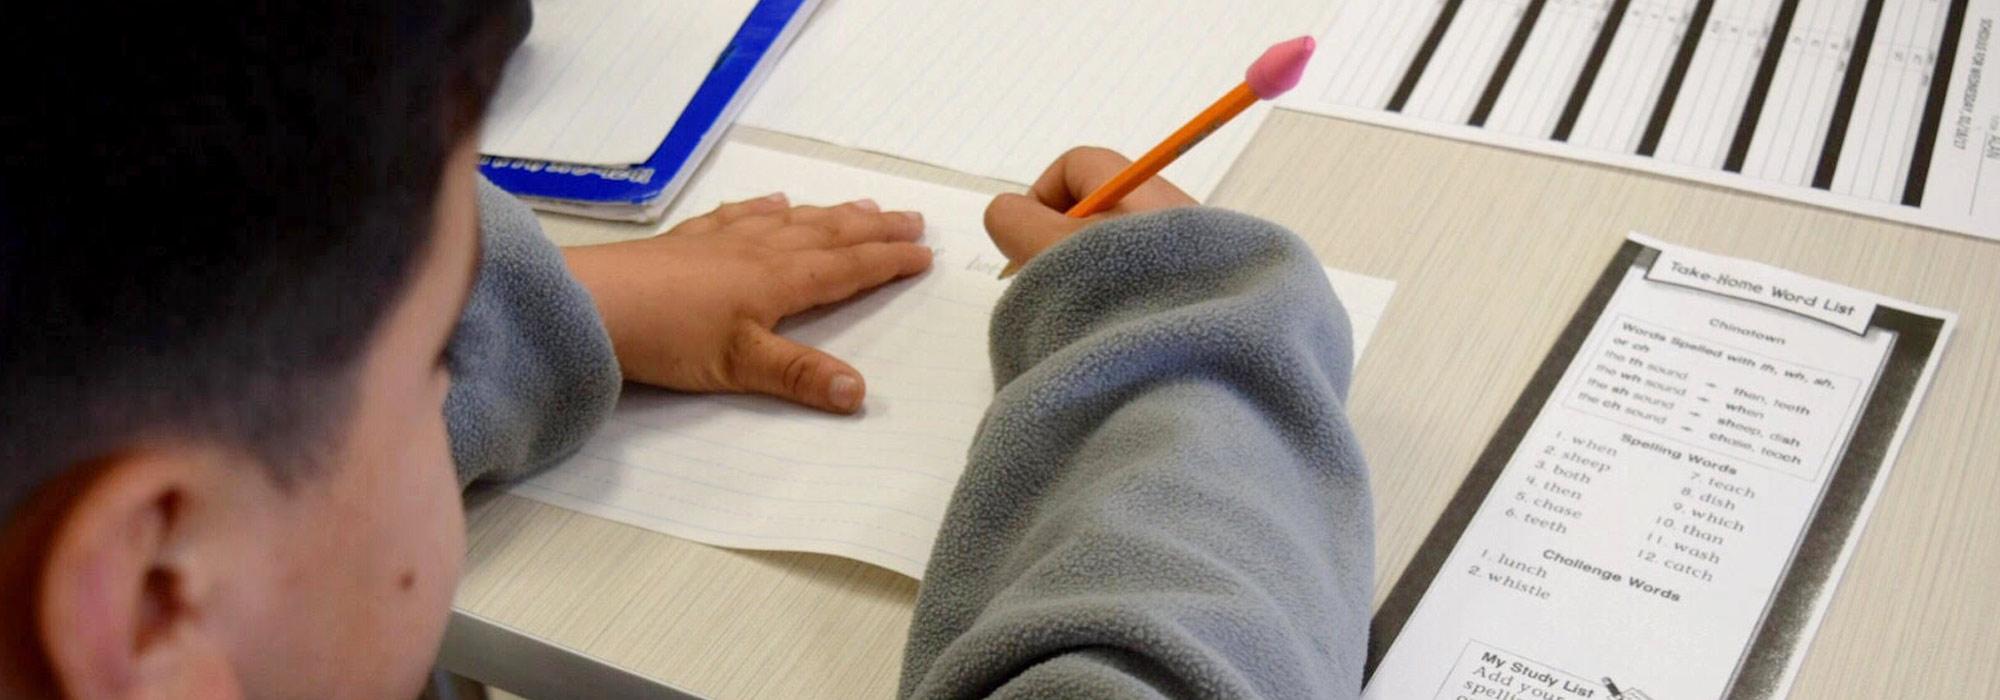 Tutoring-Club-Writing-Program